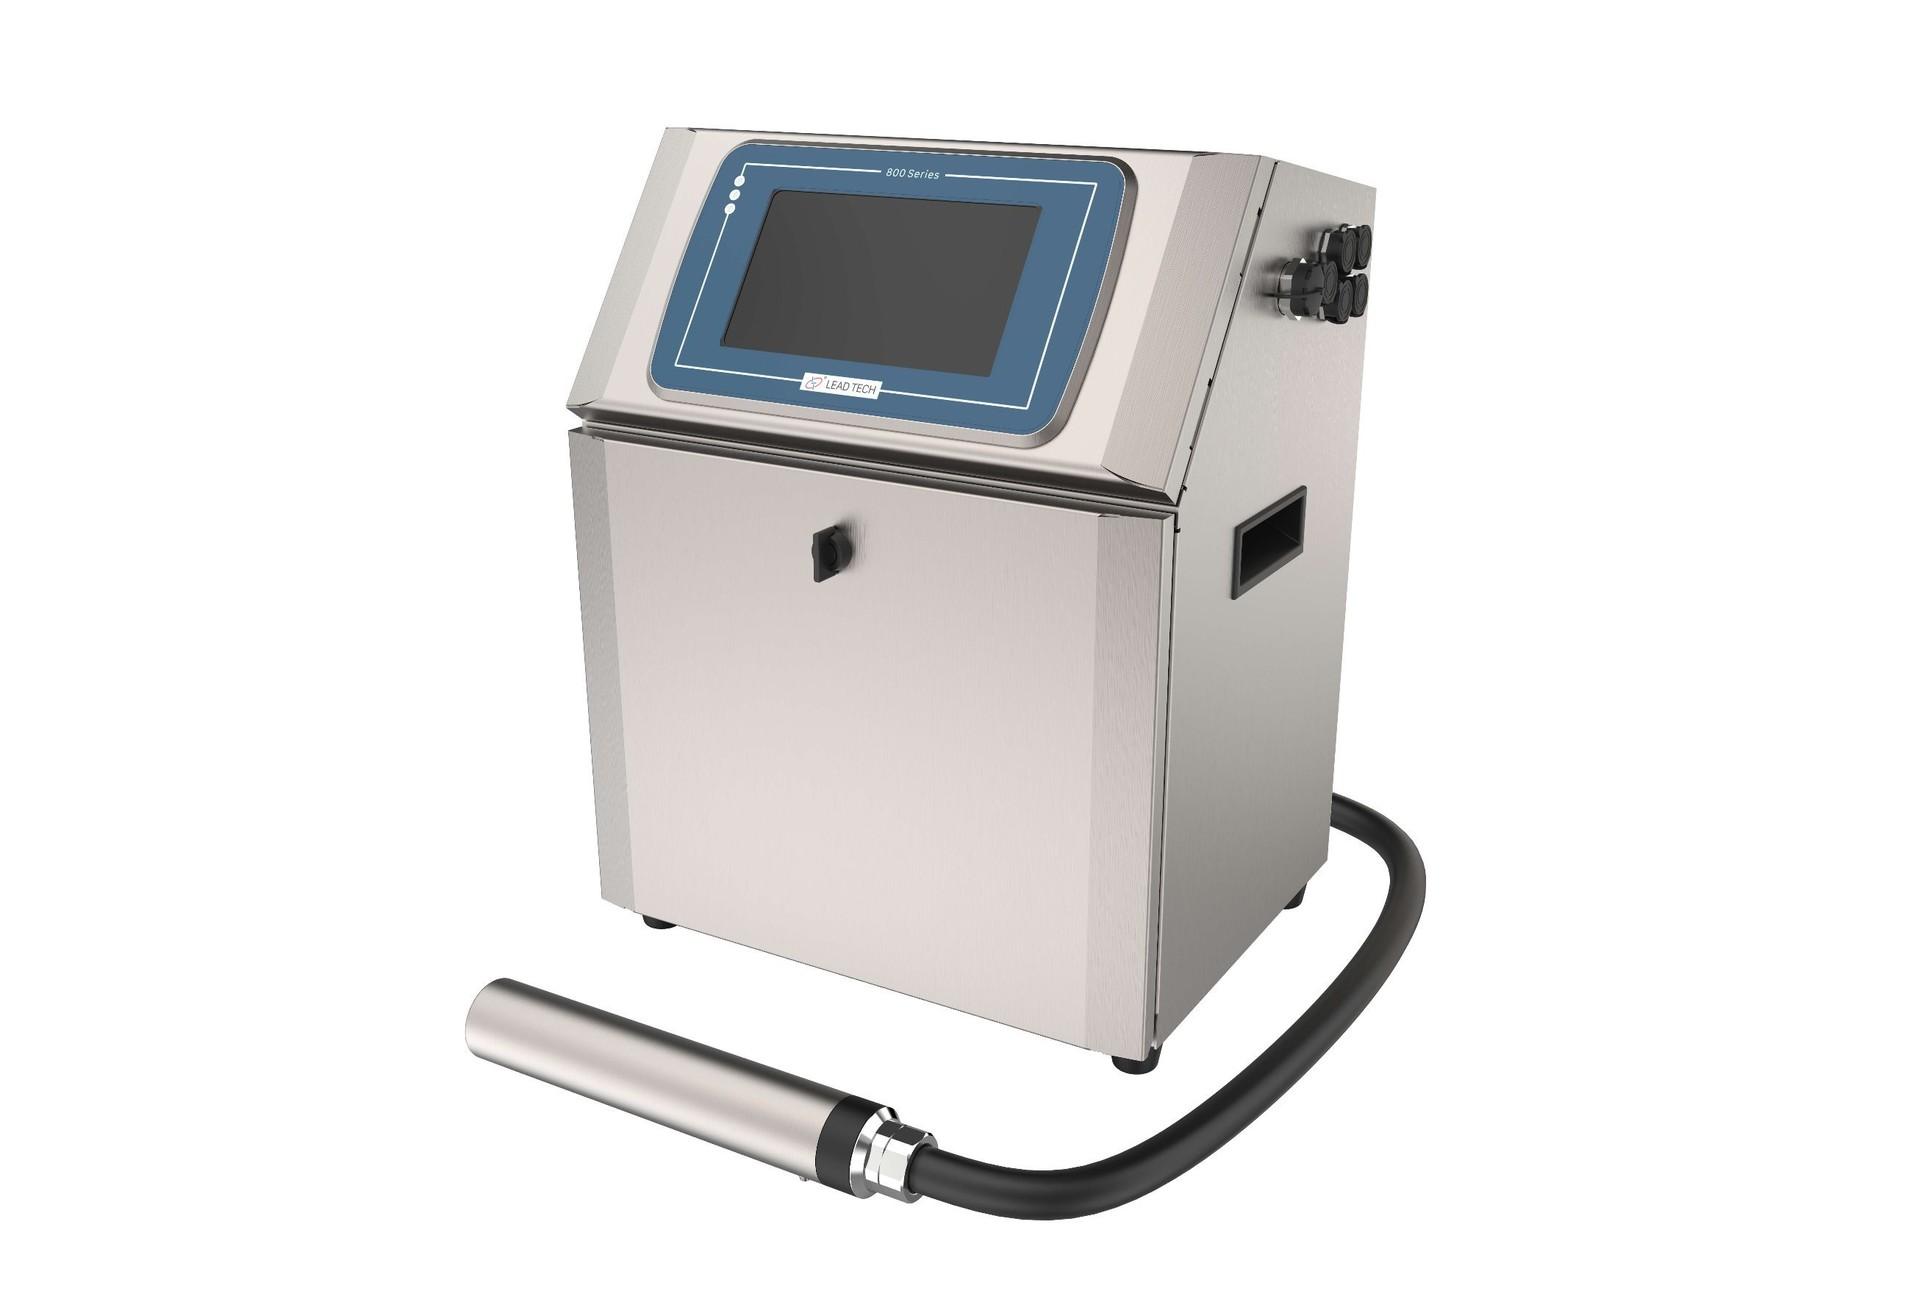 Lead Tech Lt800 Moving Automatic Head Printing Cij Inkjet Printer